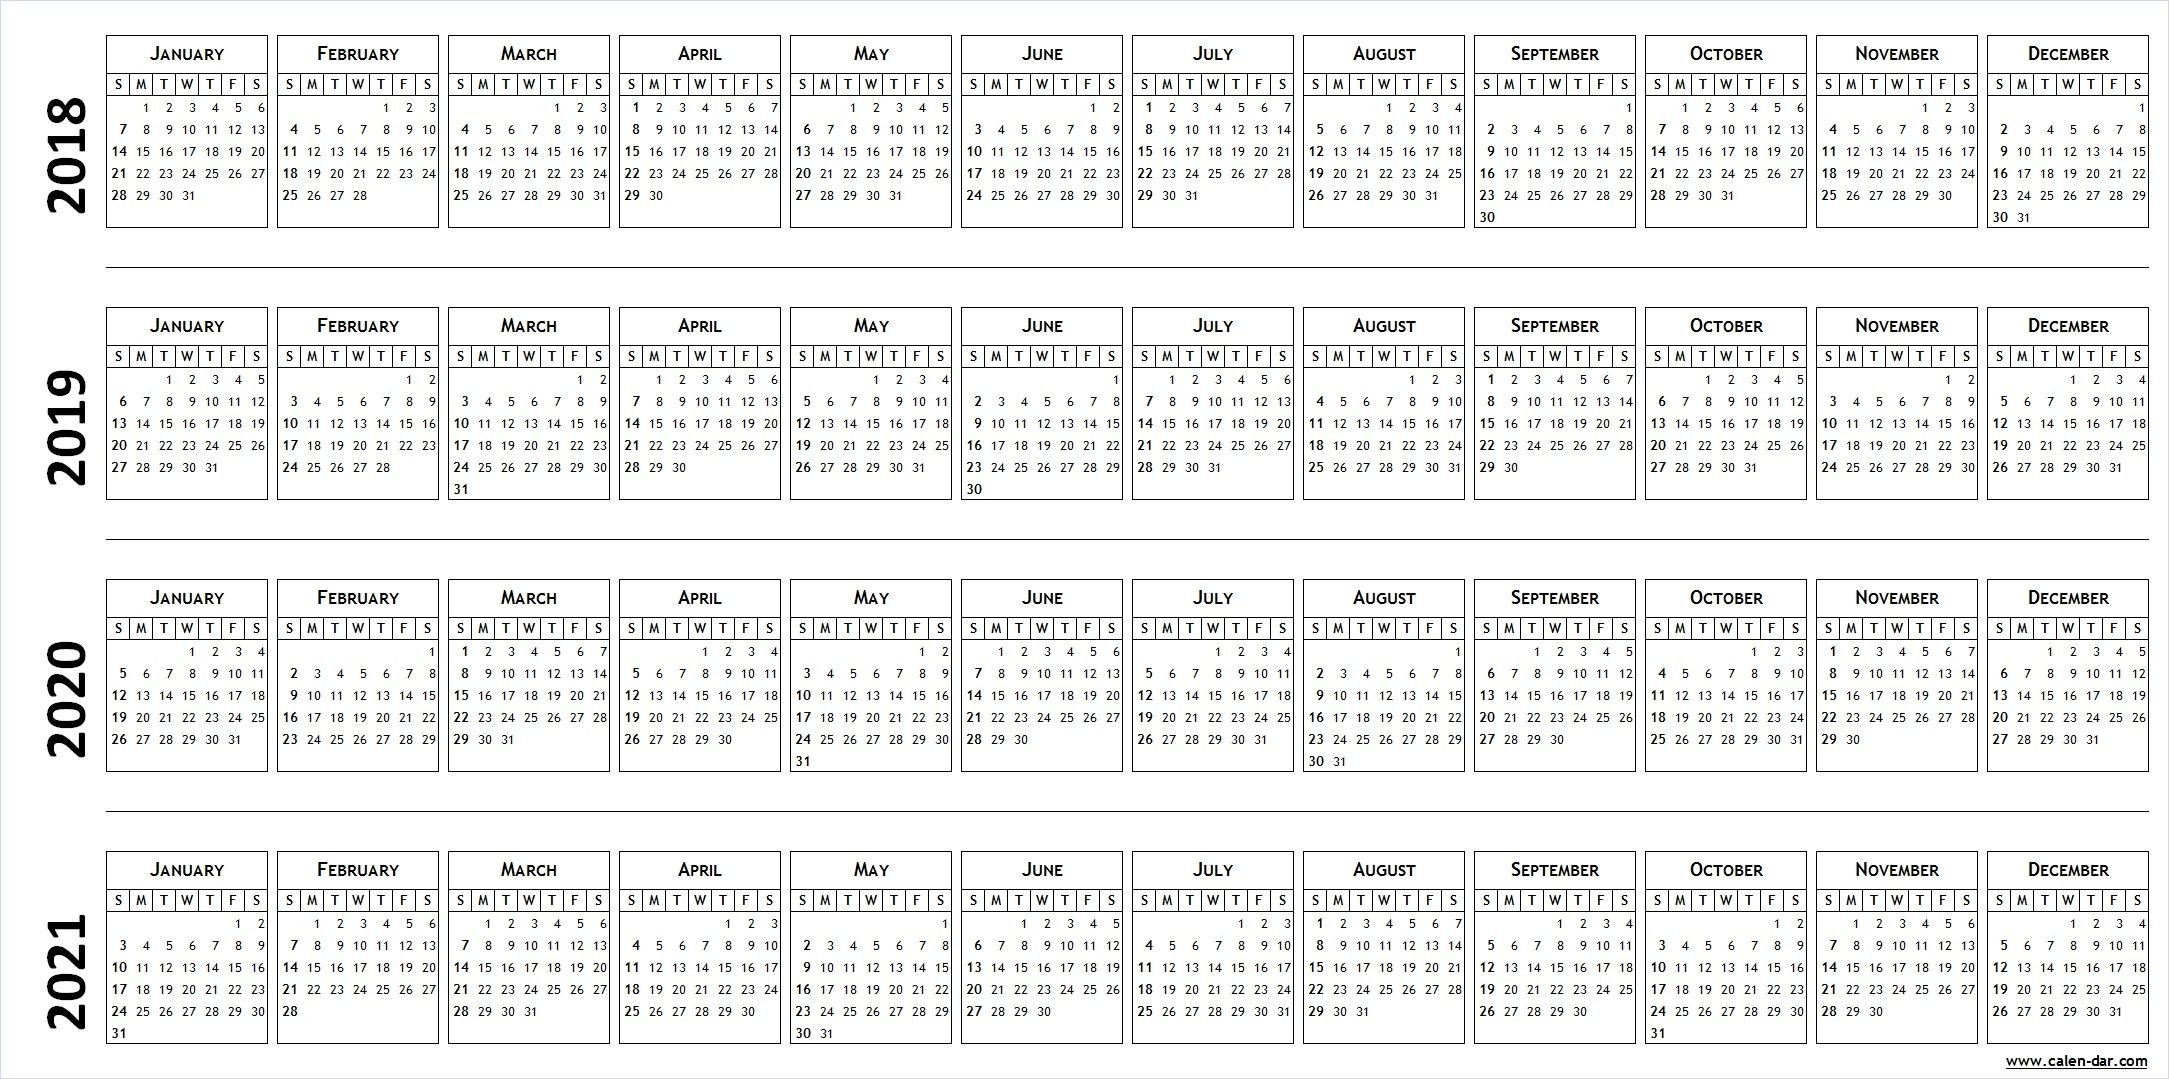 4-Four Year Blank Calendar 2018 2019 2020 2021 | Calendar 4 Year Calendar 2019 To 2022 Printable